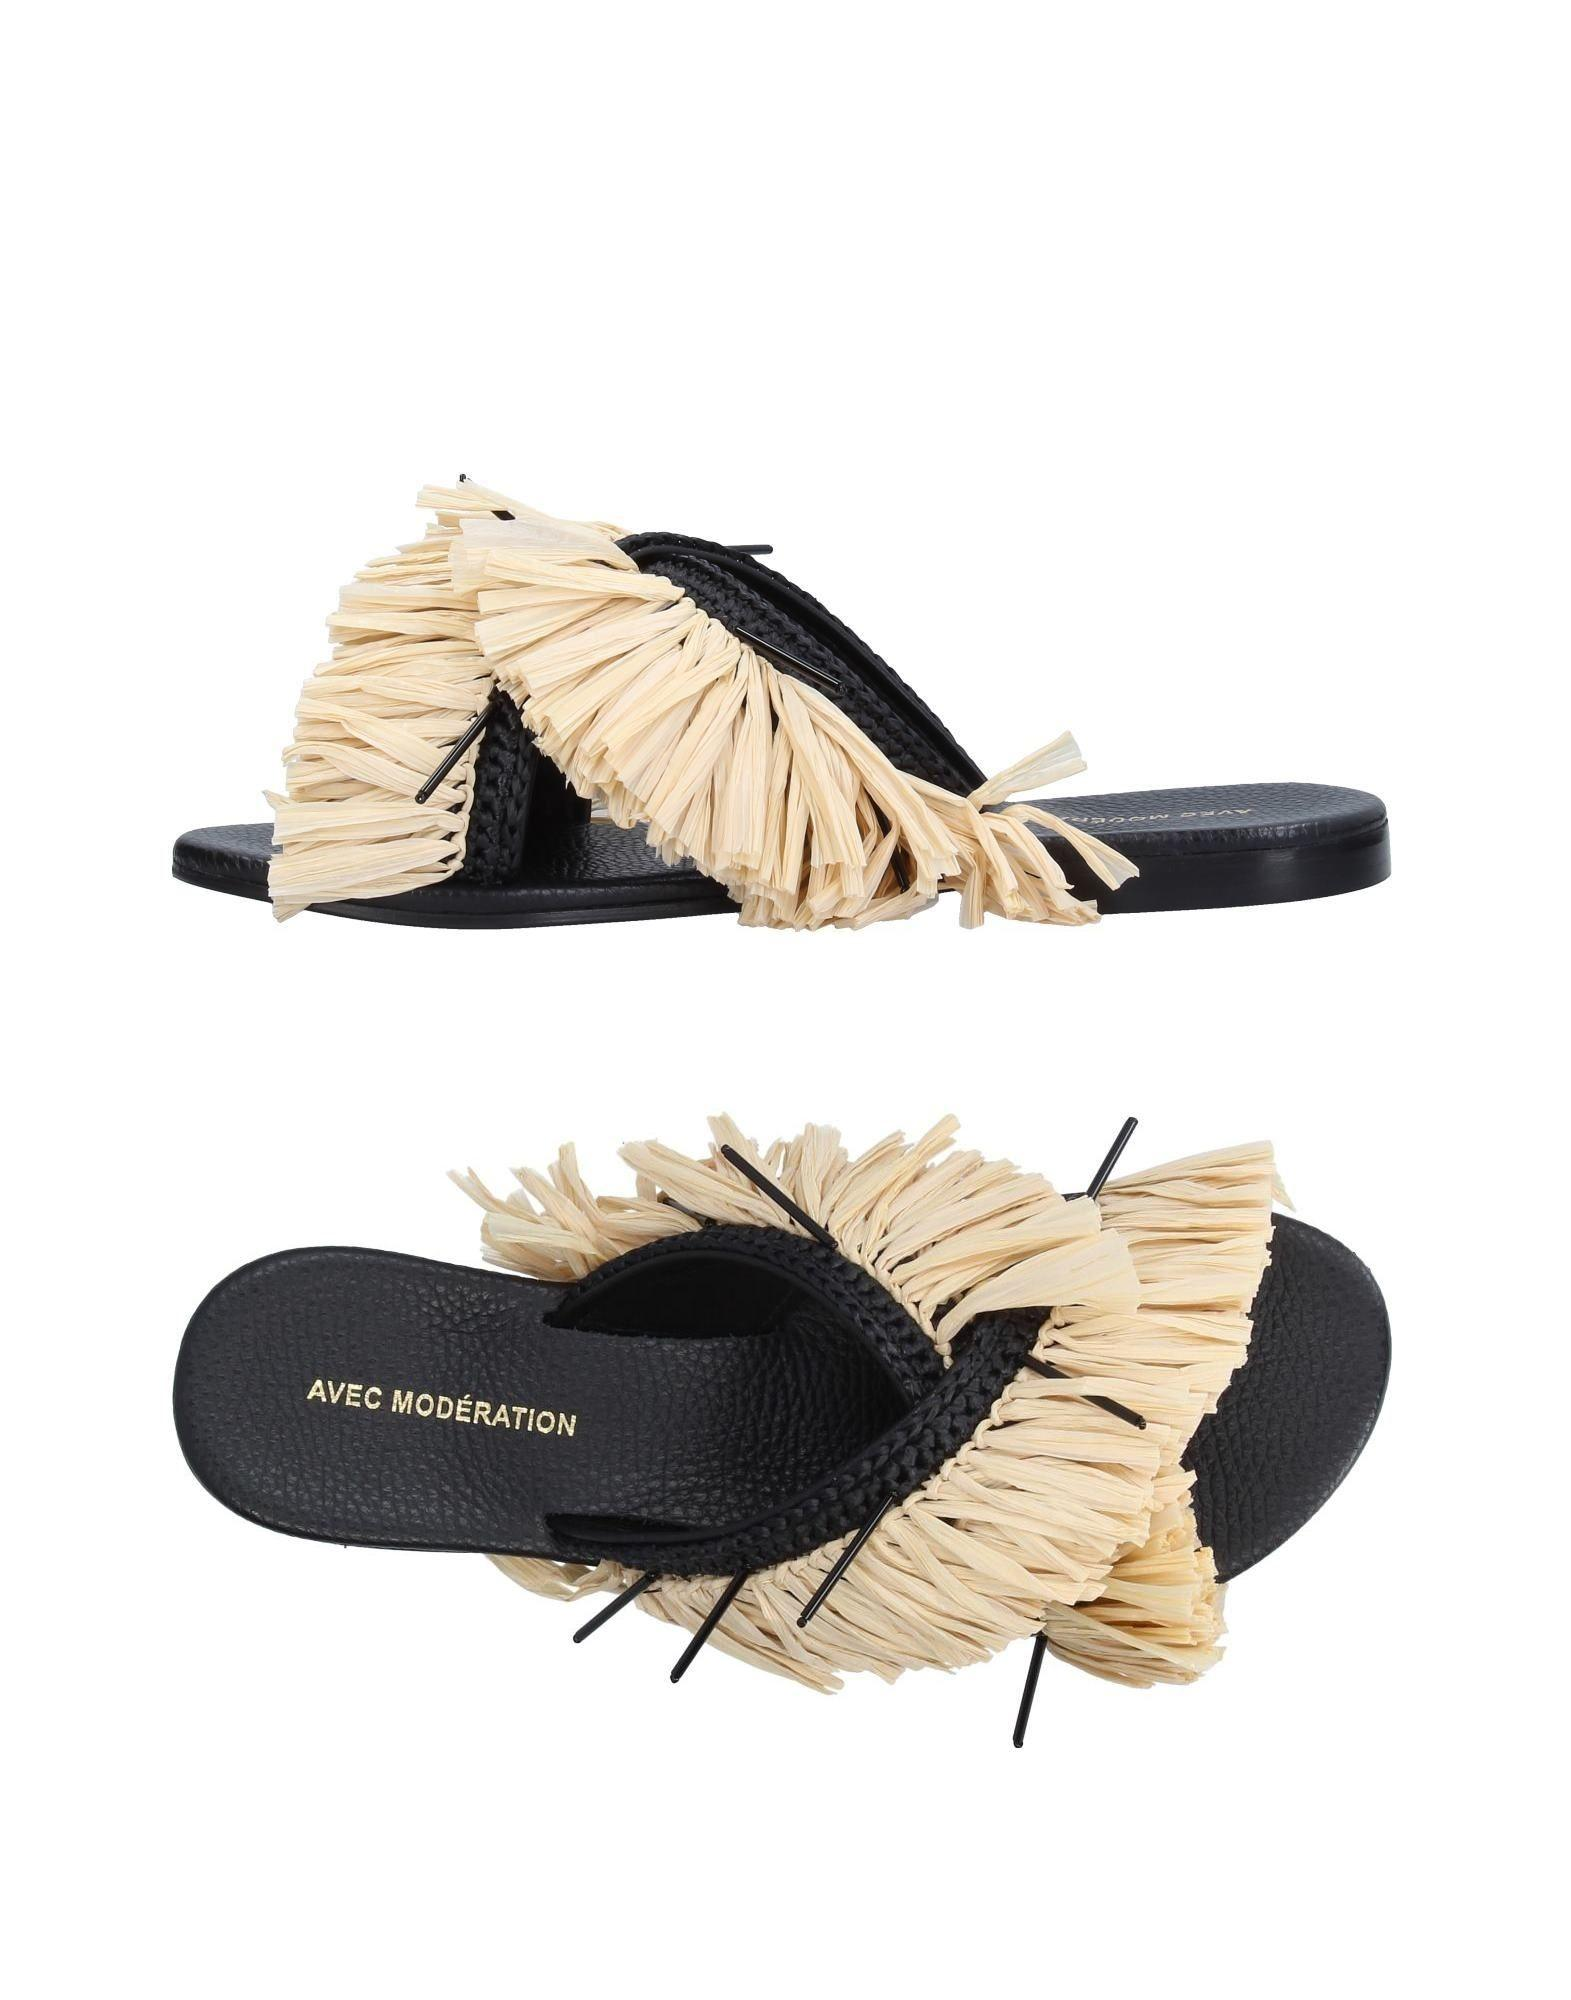 Avec ModÉration Sandals In Beige